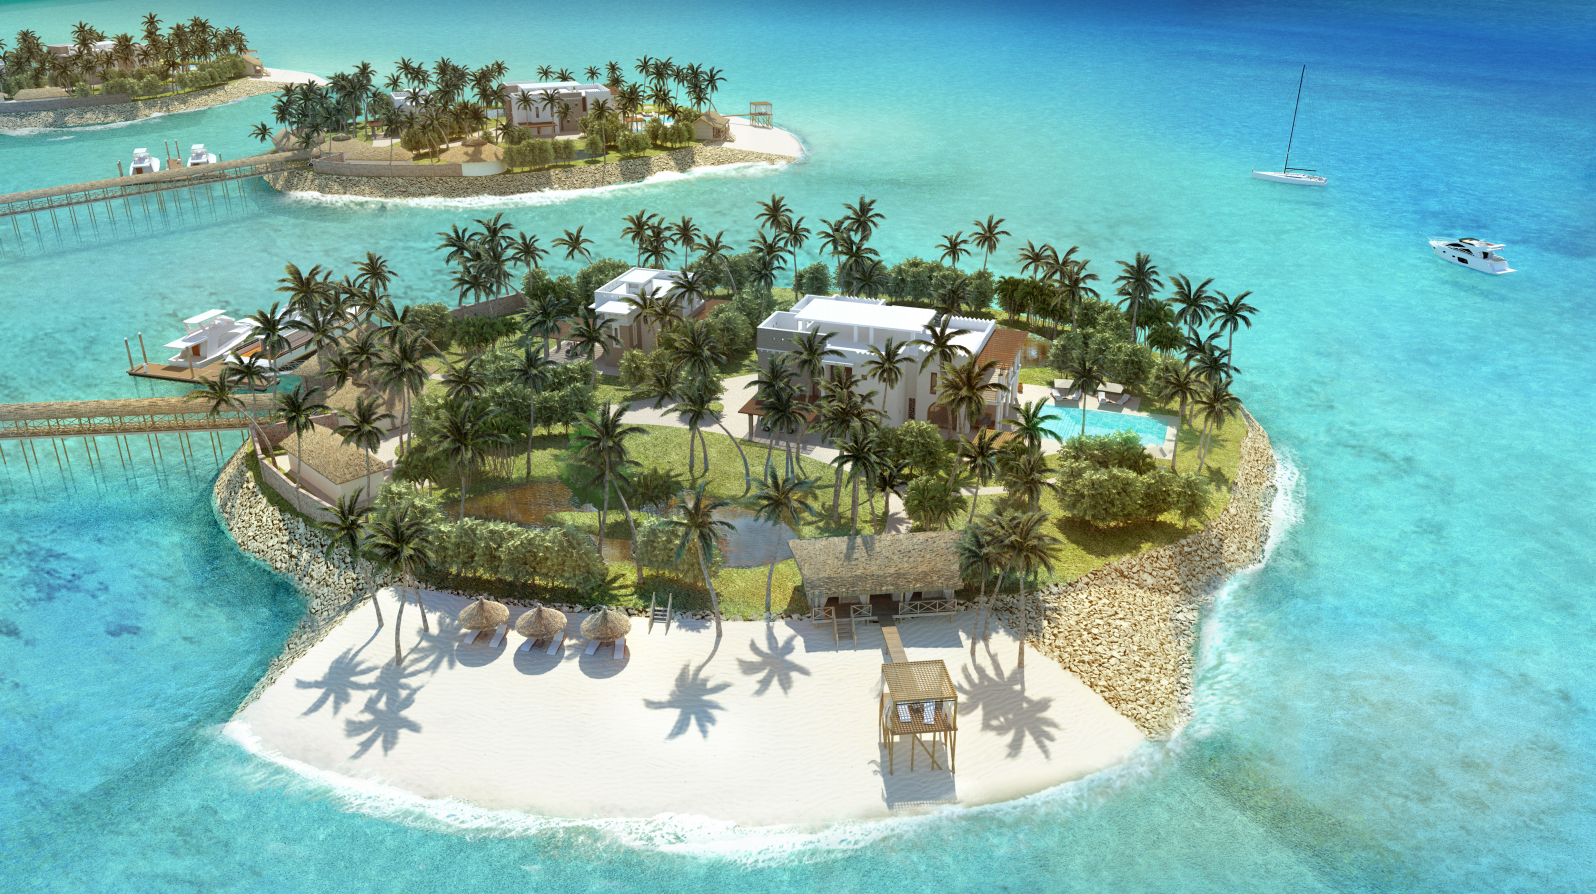 Tanzania: Isles Unveils Team for Tourism Festival